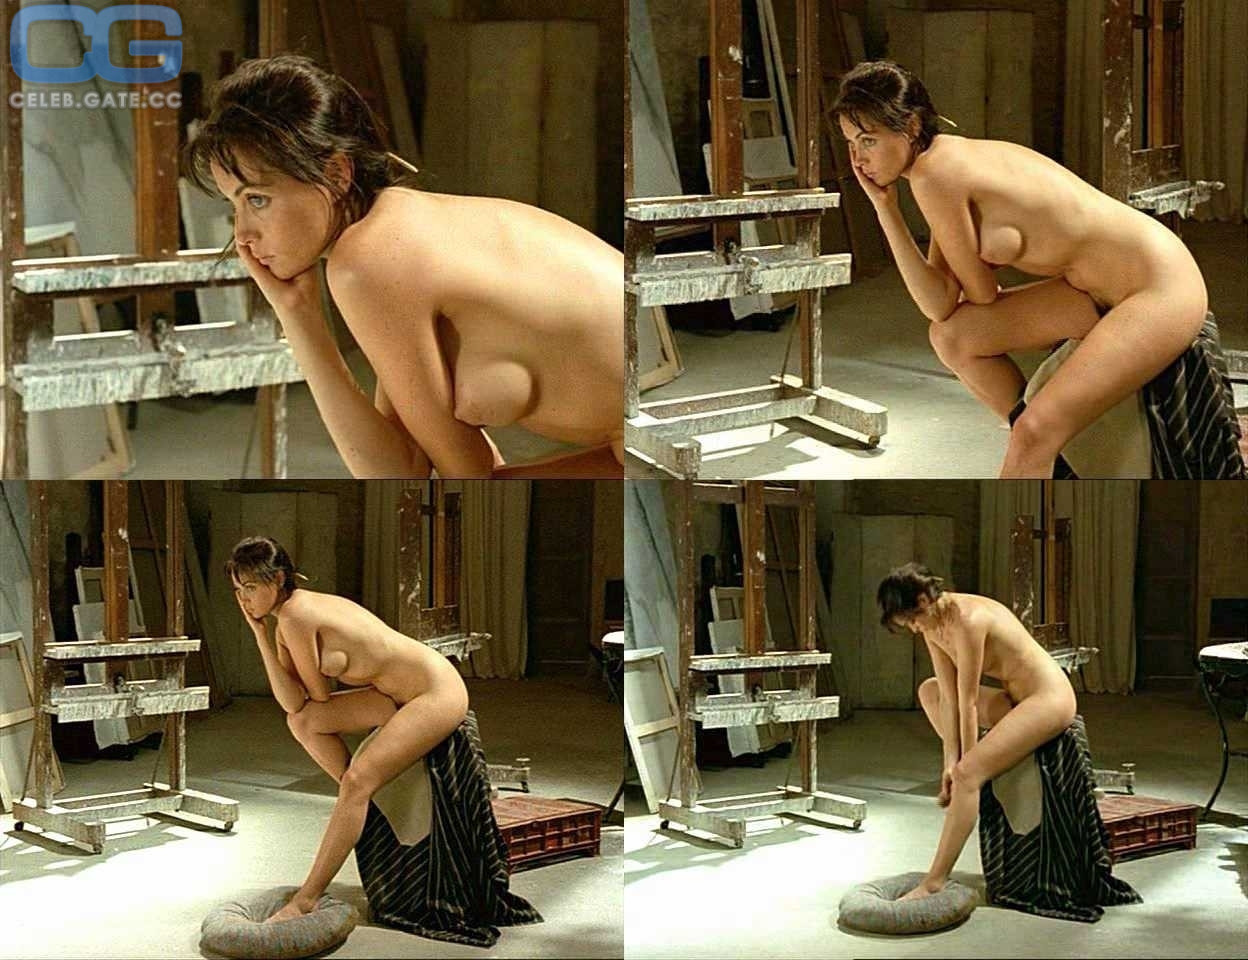 Emmanuelle beart video nude